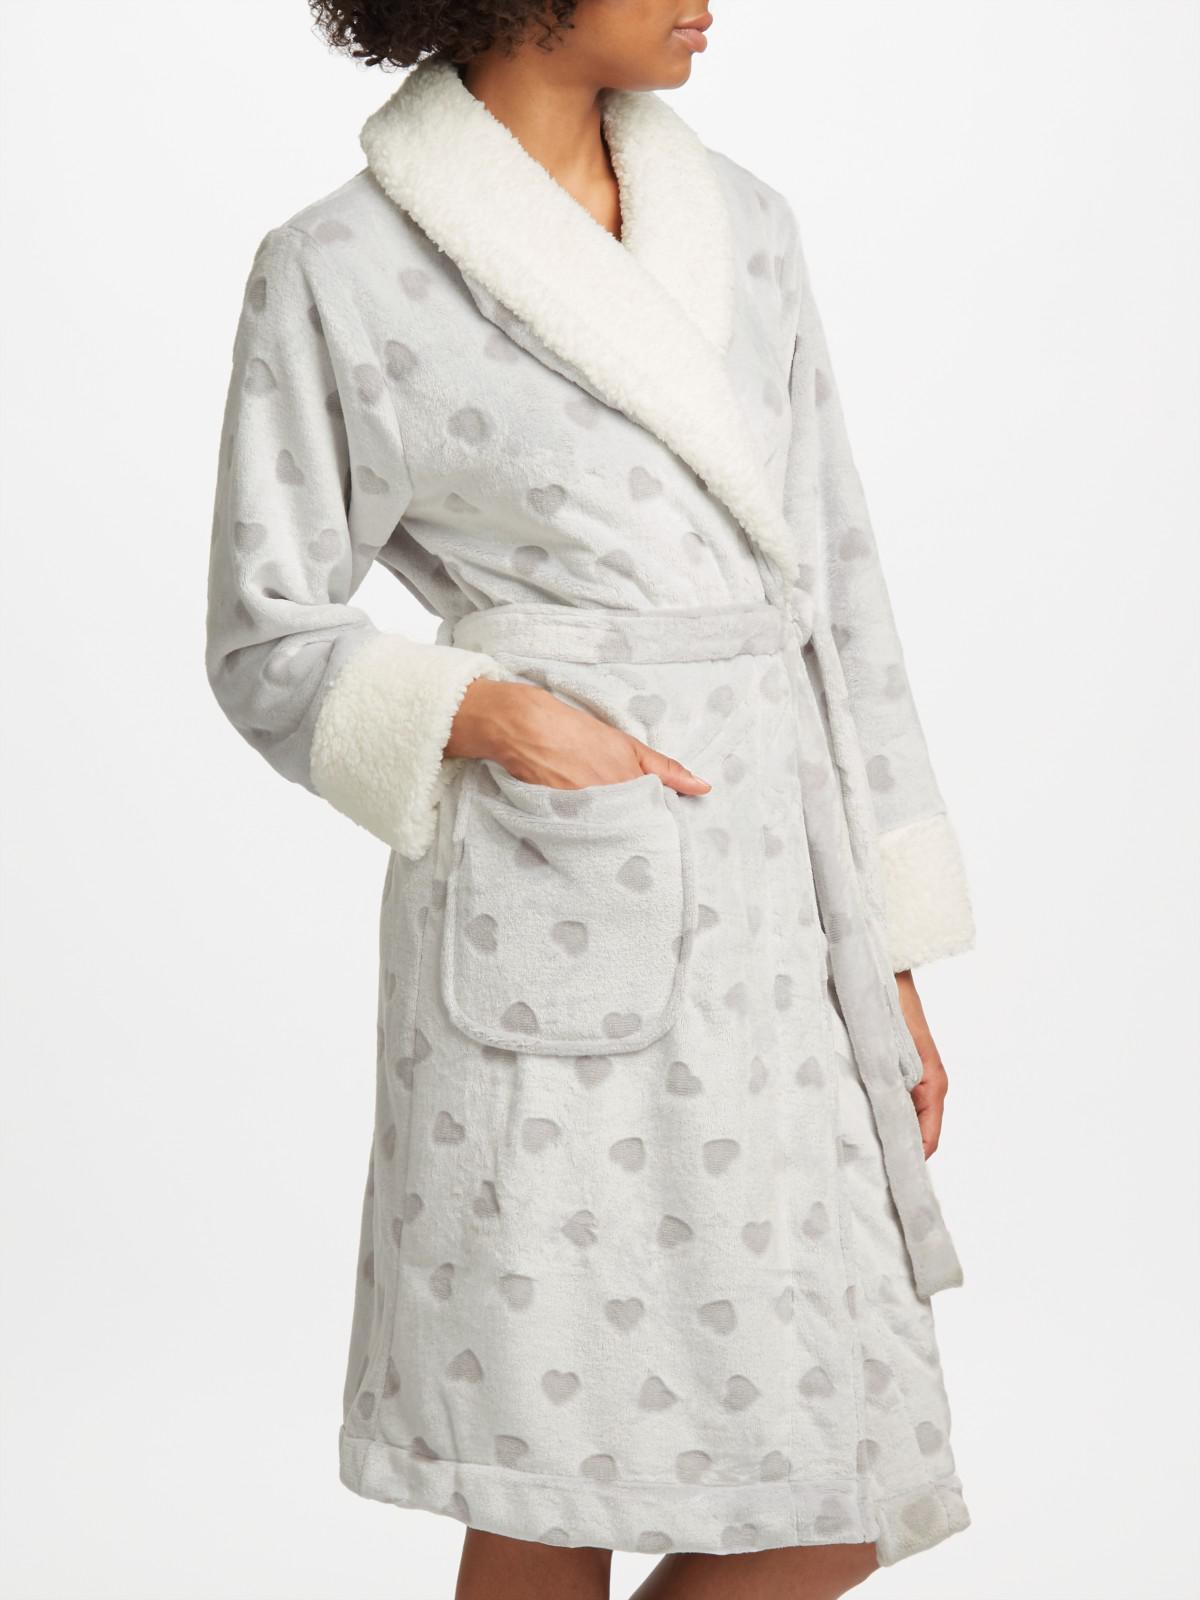 John Lewis Heart Embossed Fleece Dressing Gown in Gray - Lyst